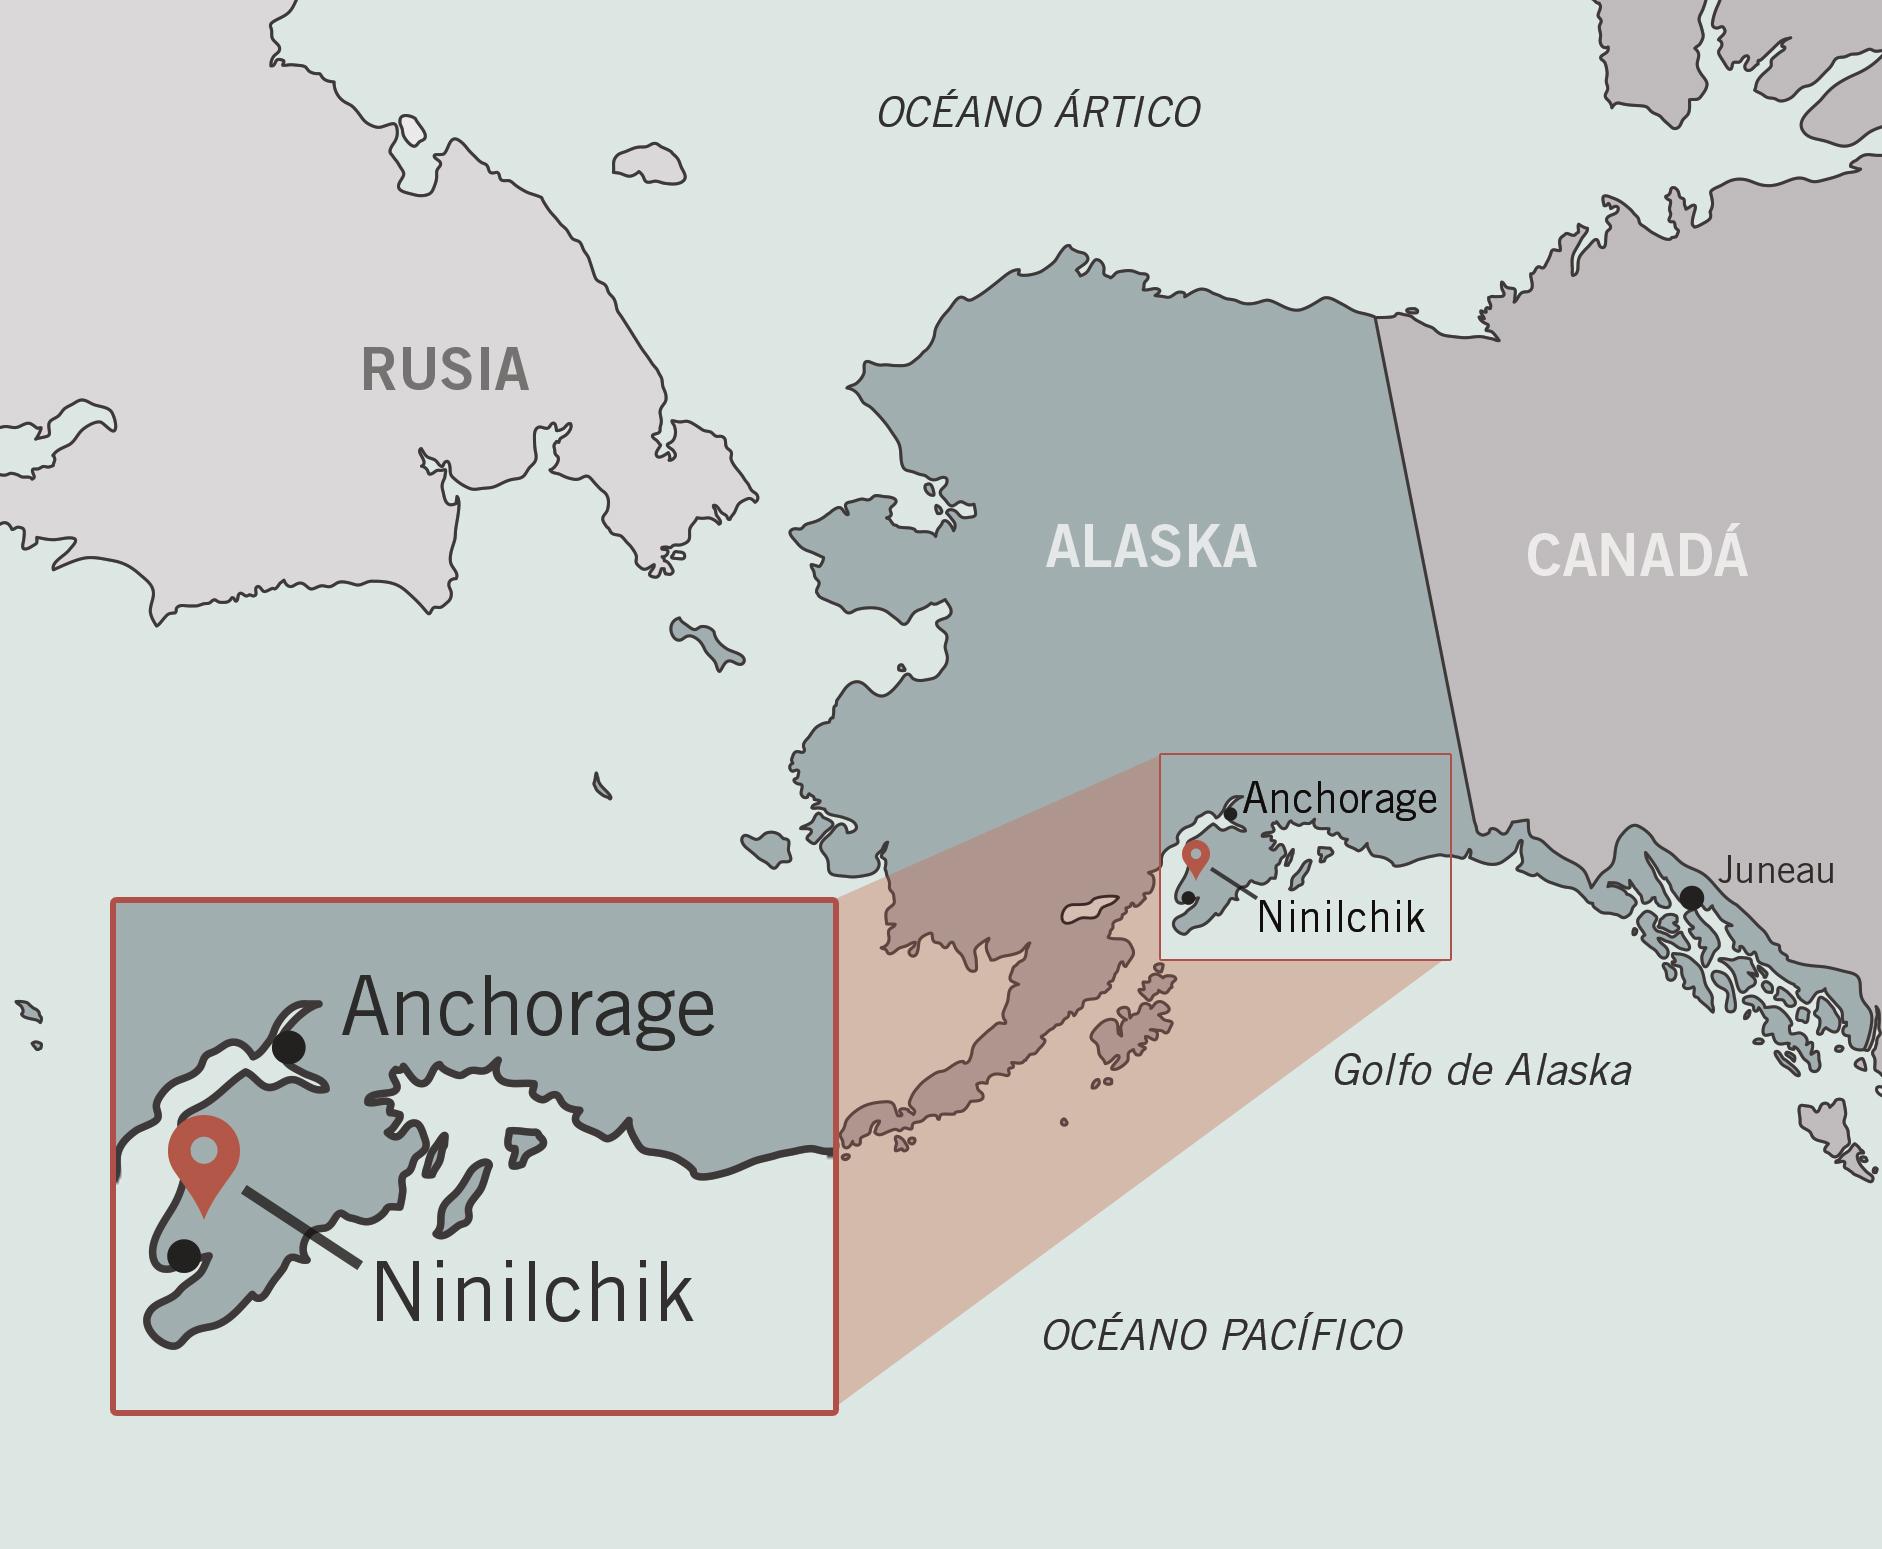 Mapa de Alaska con destacado de la localización de Ninilchik (Depto. de Estado/O. Mertz)